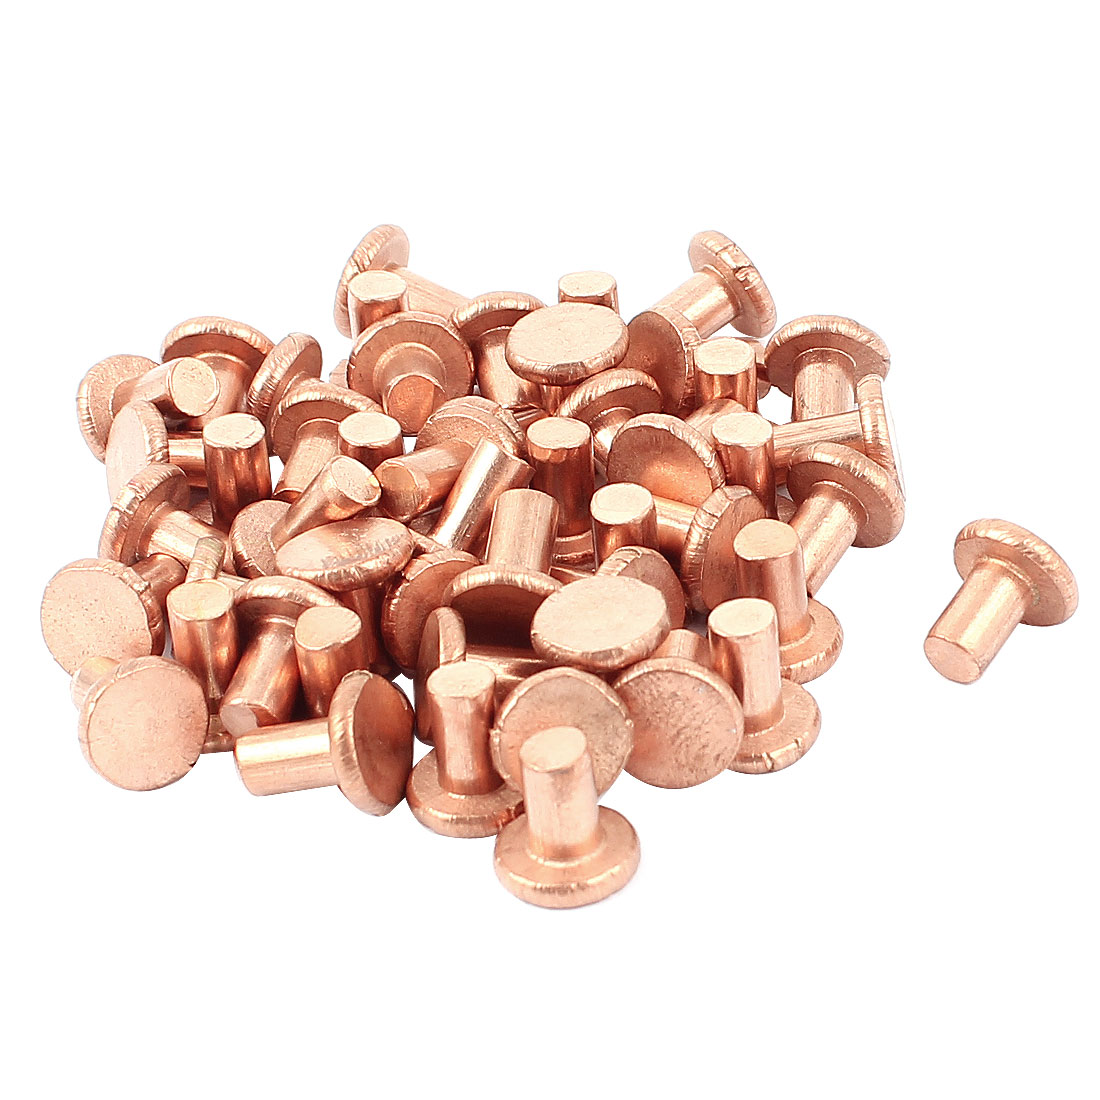 "50 Pcs 13/64"" Diameter 5/16"" Long Shank Flat Head Bolts Copper Solid Rivets Fasteners"